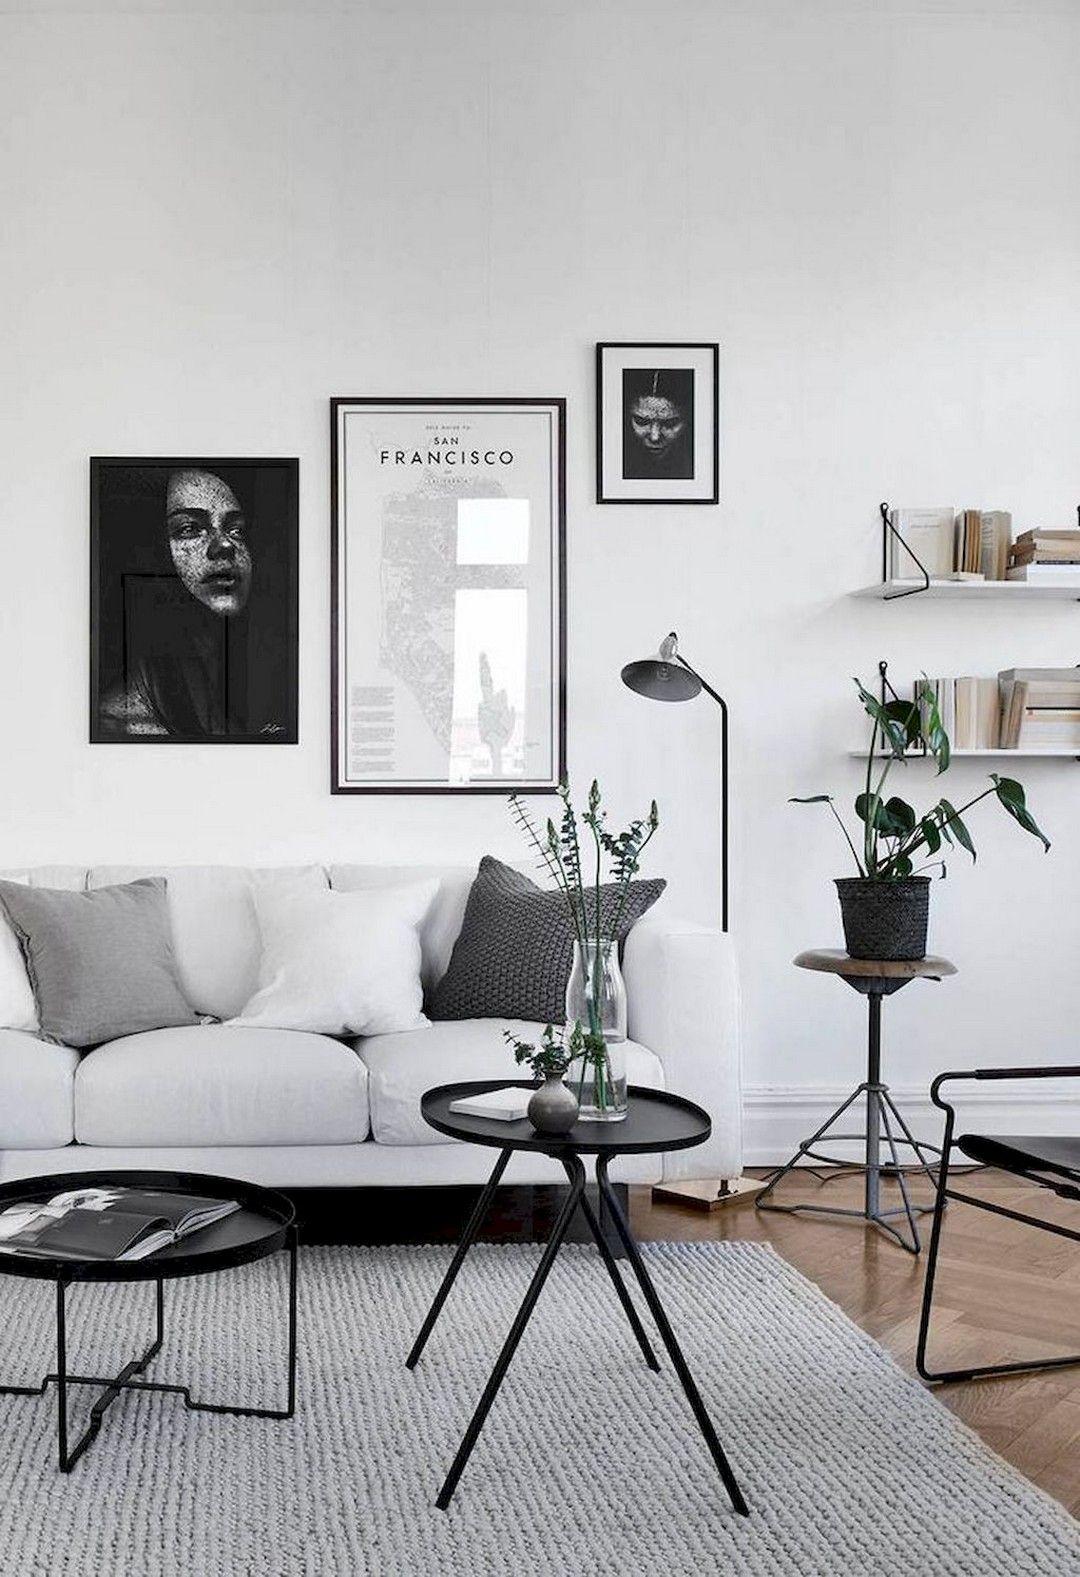 Rustic Scandinavian Living Room Design Ideas Decomagz Minimalist Living Room Decor Living Room Scandinavian Minimalist Living Room Design